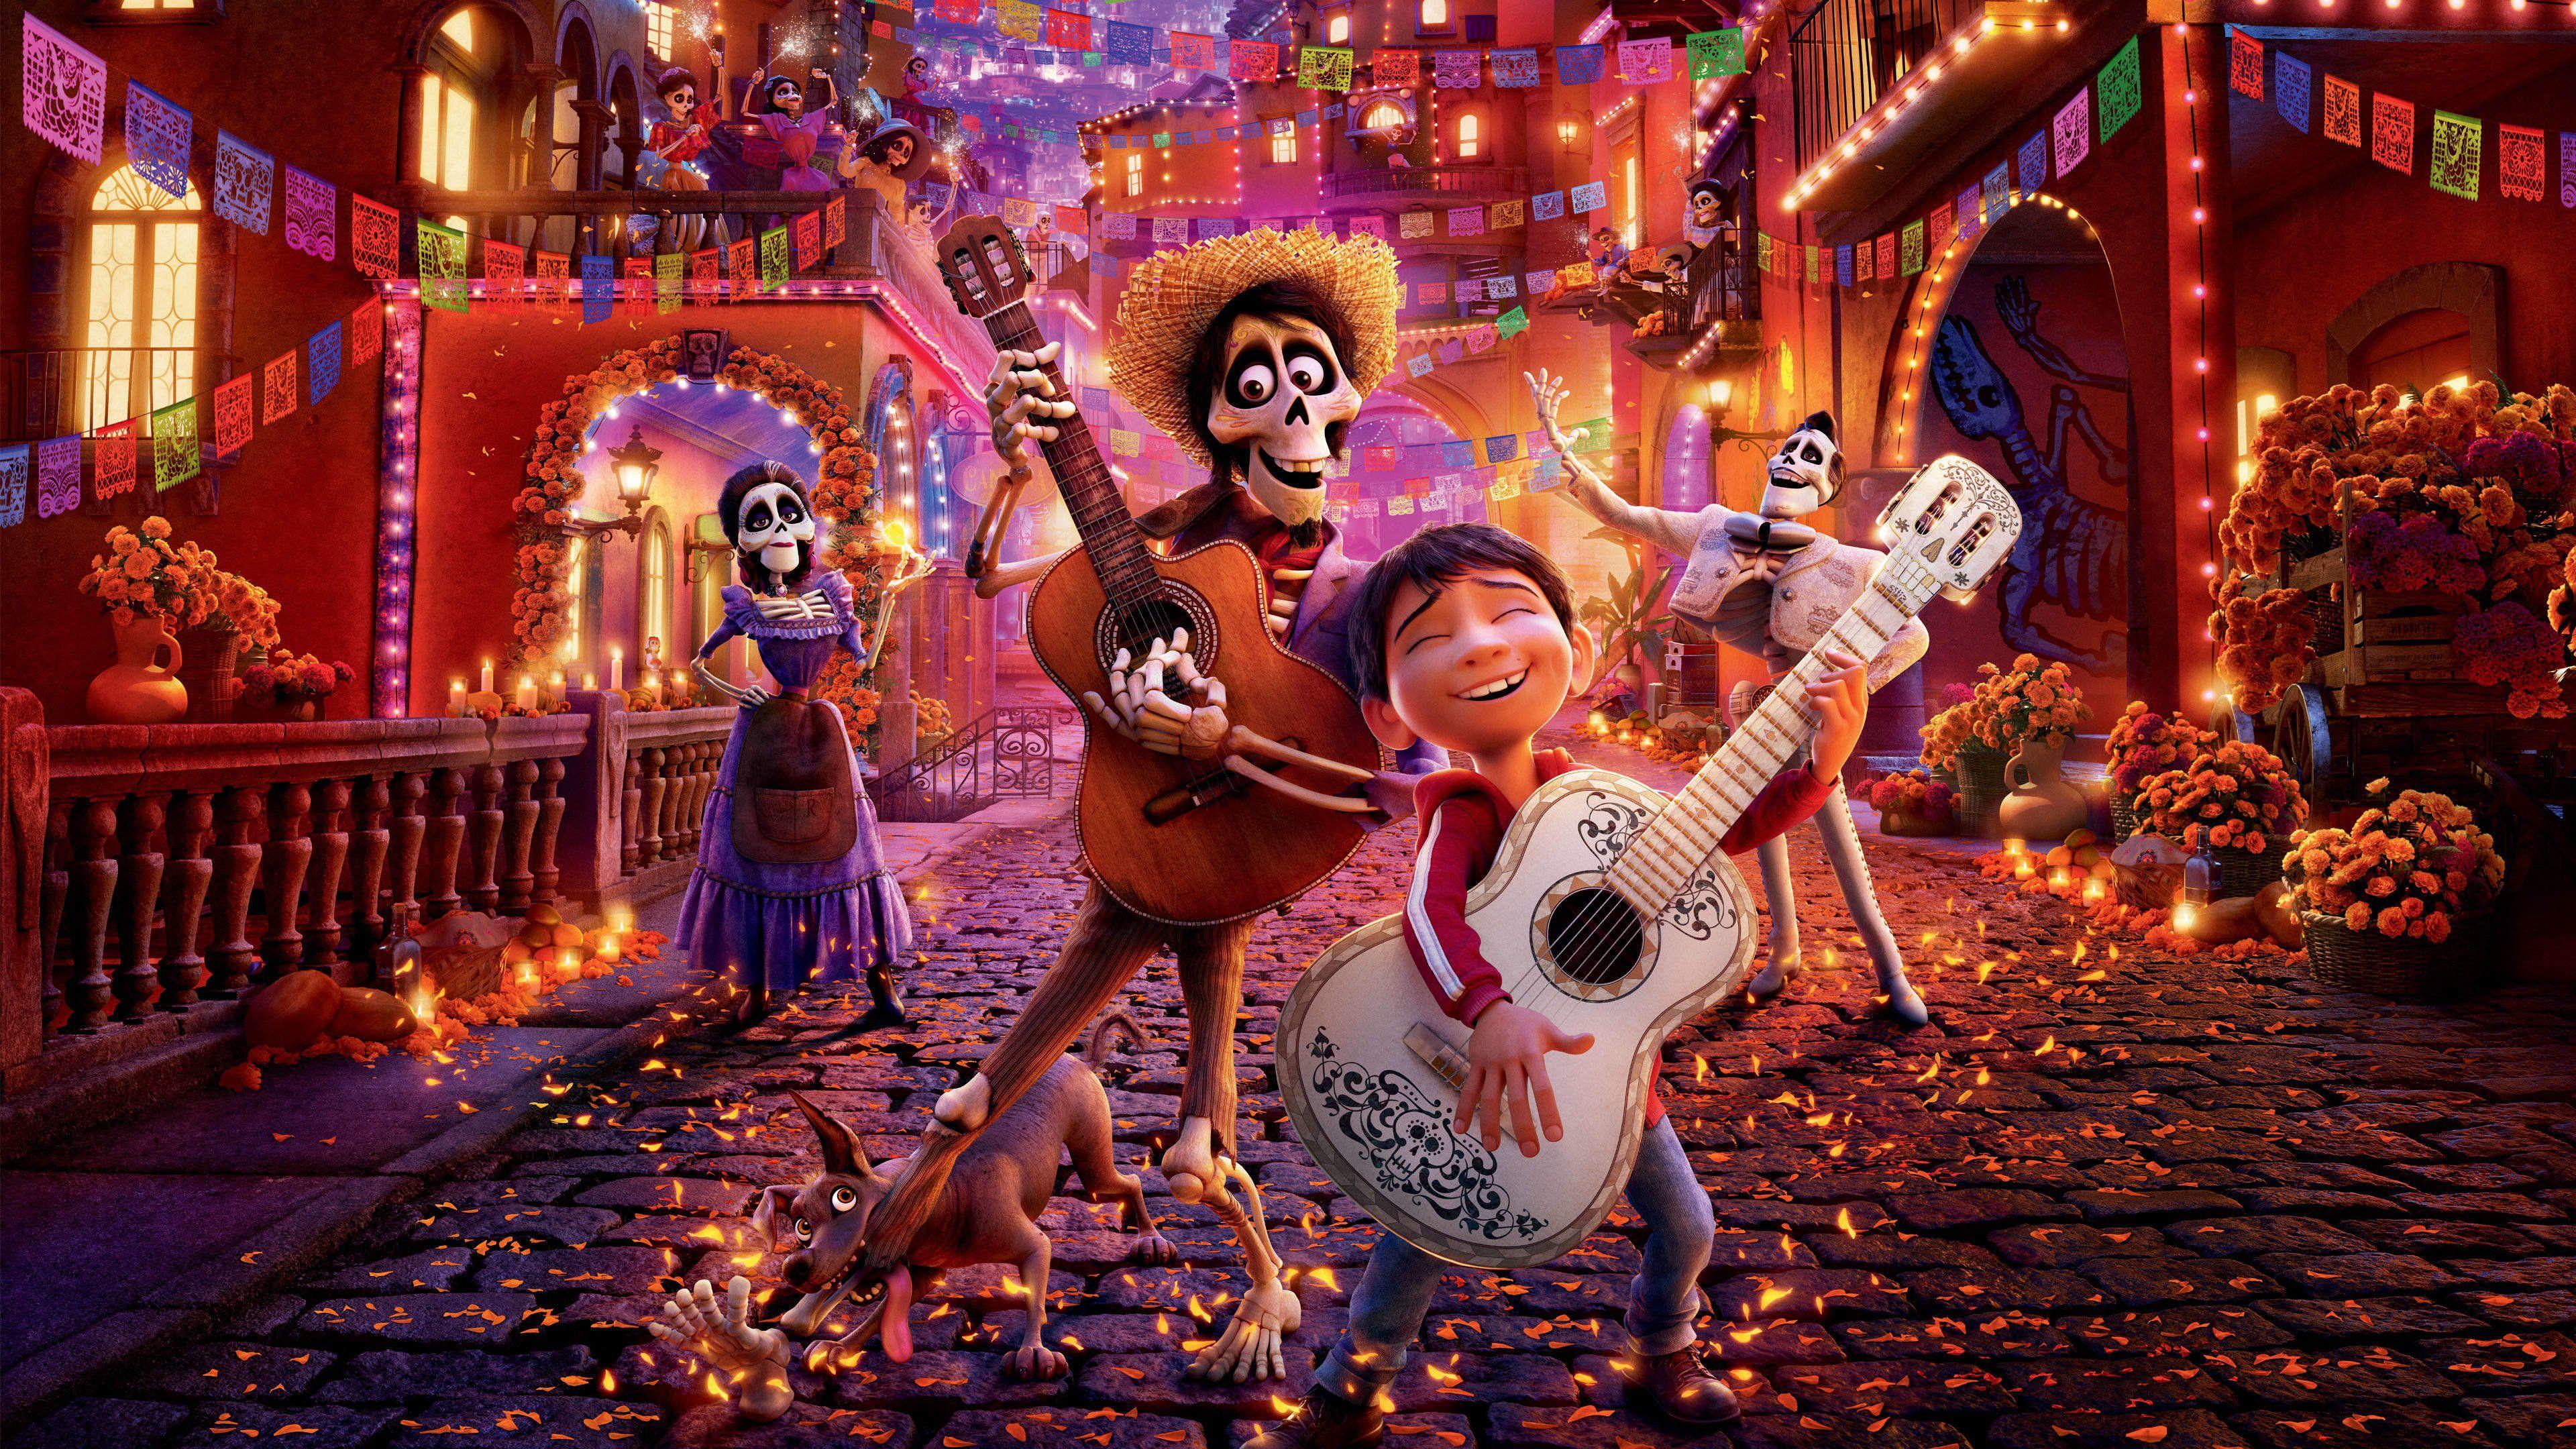 pozo Deshacer rotación  Coco (2017) - Online O Descarga HD Gratis   Coco pelicula, Peliculas  animadas de disney, Películas de animación